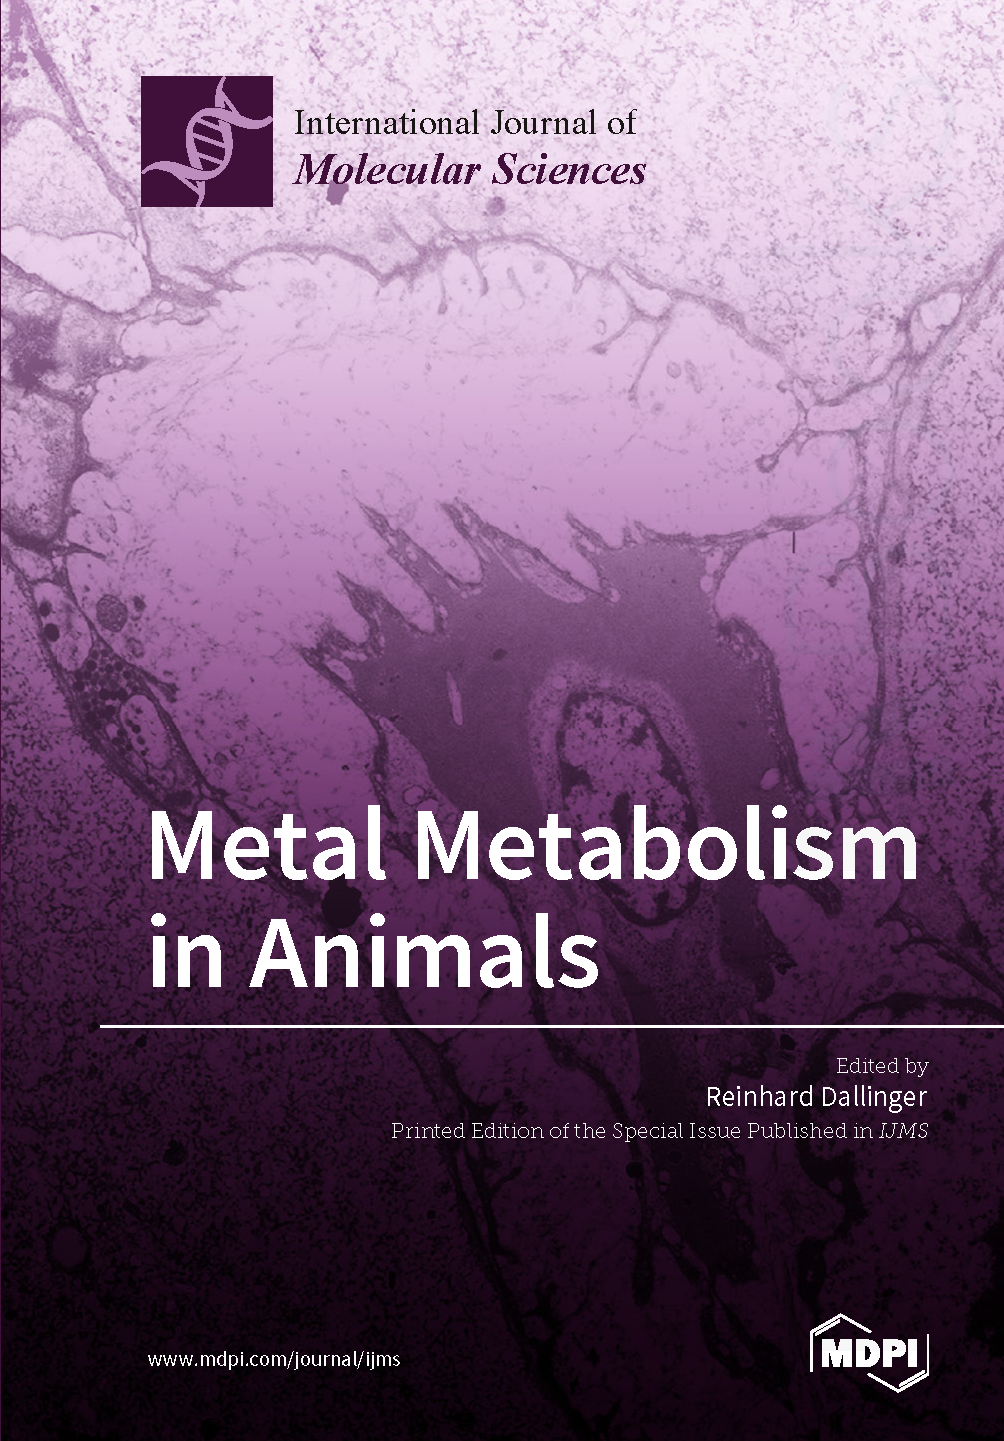 Metal Metabolism in Animals